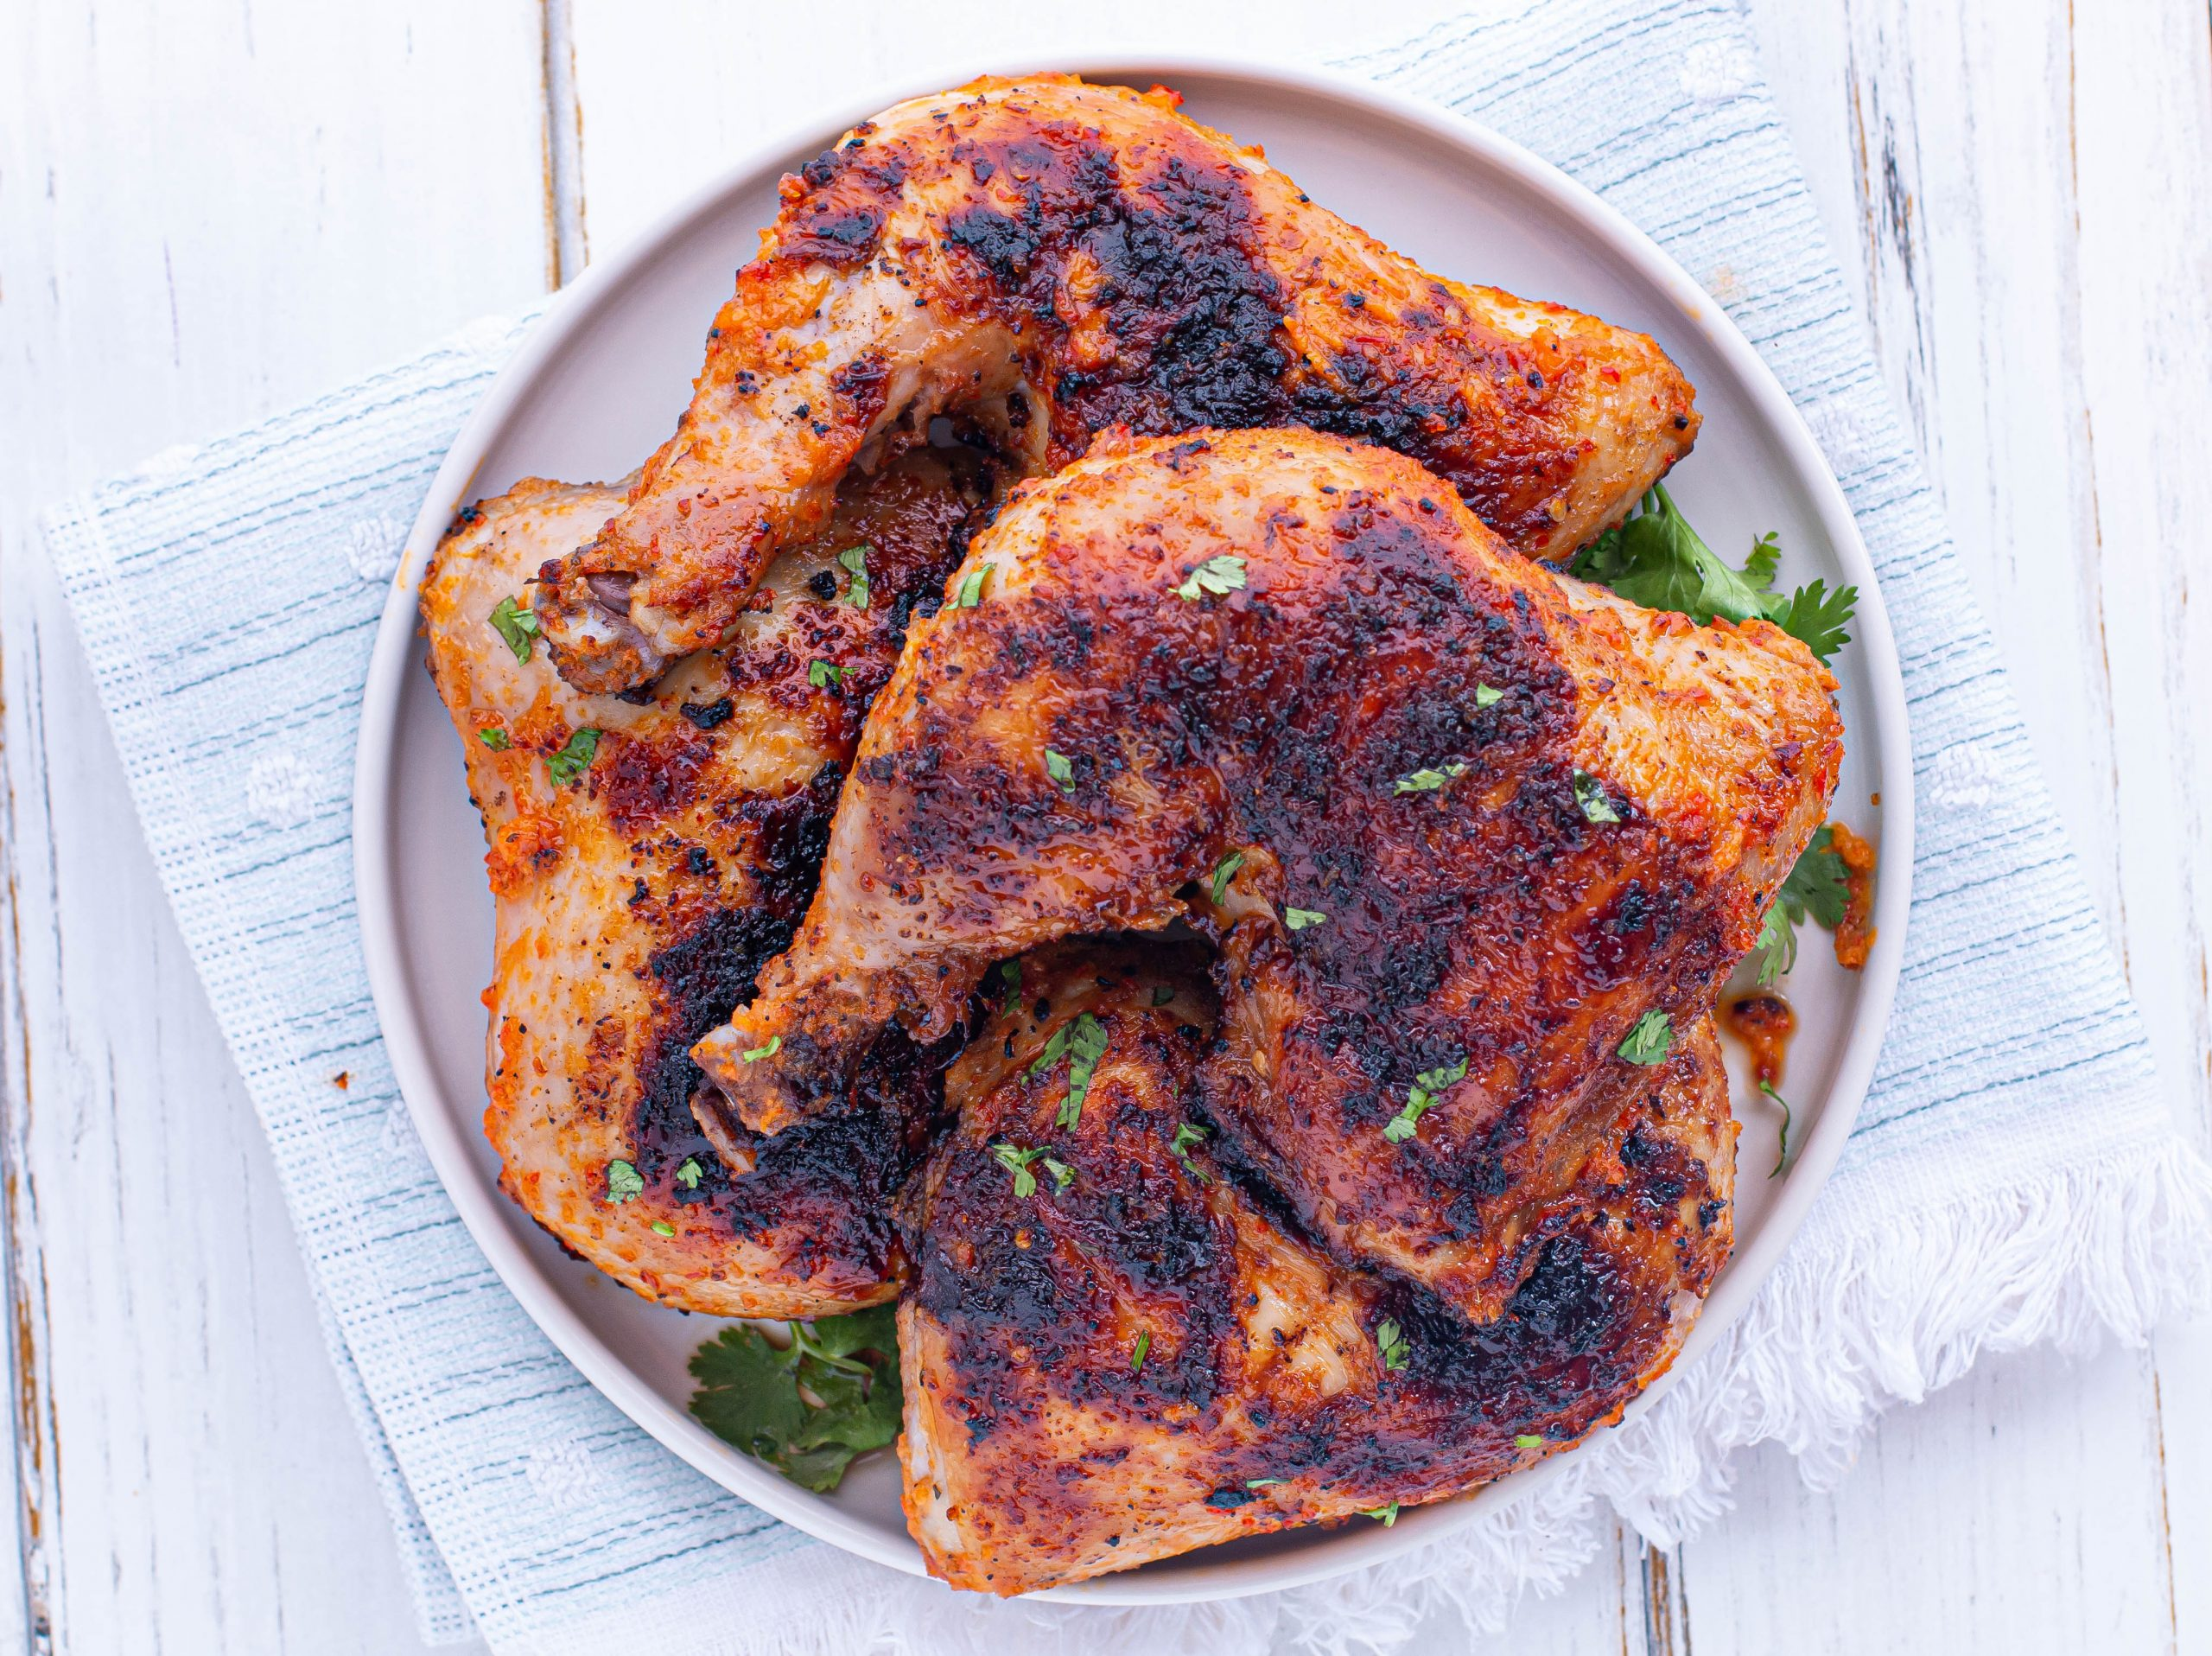 Peri Peri Chicken (Nandos Style)